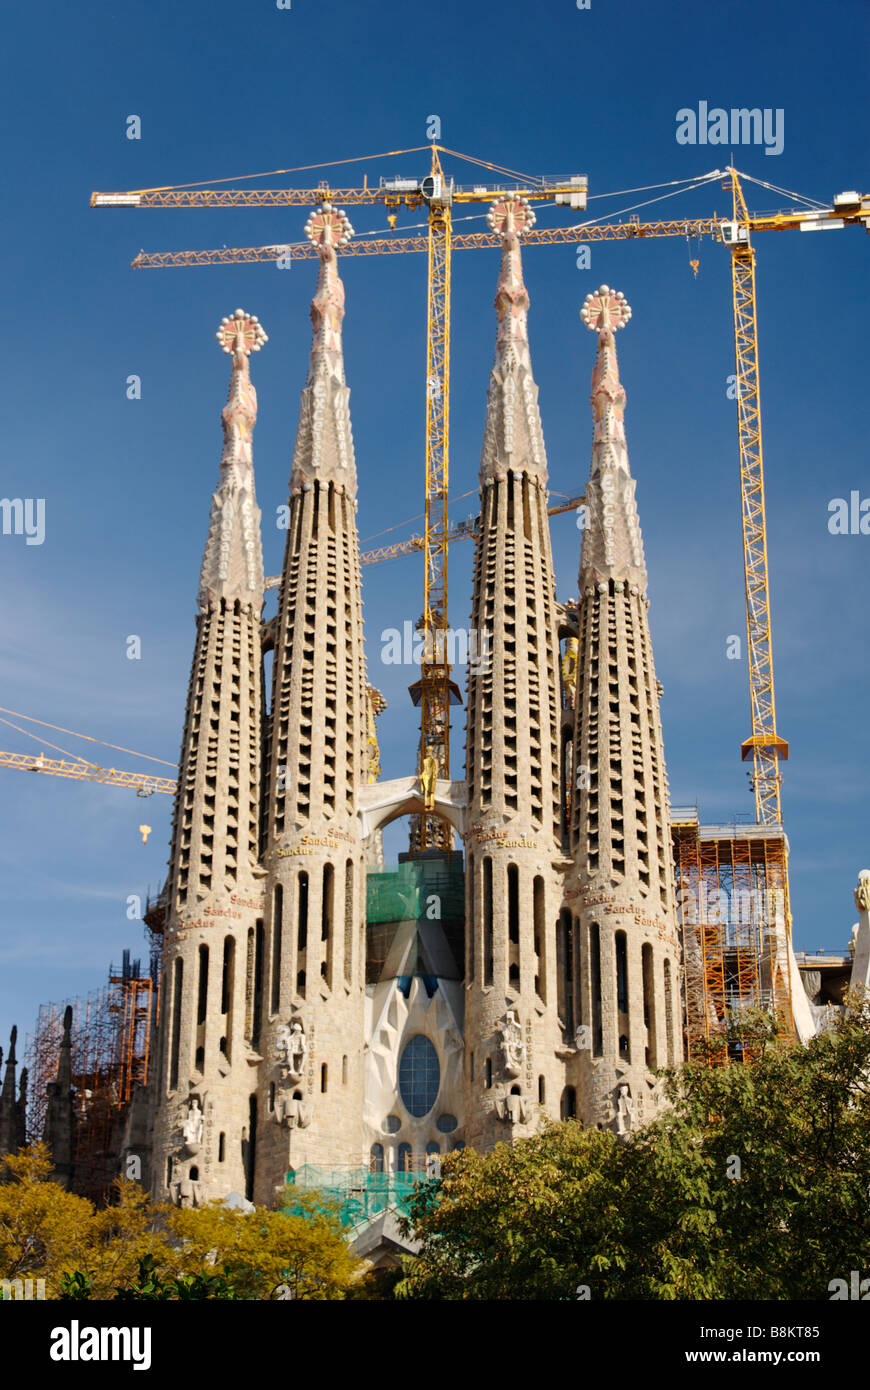 Sagrada Família Kirche modernistischen Architekten Antoni Gaudí Barcelona Spanien Stockbild